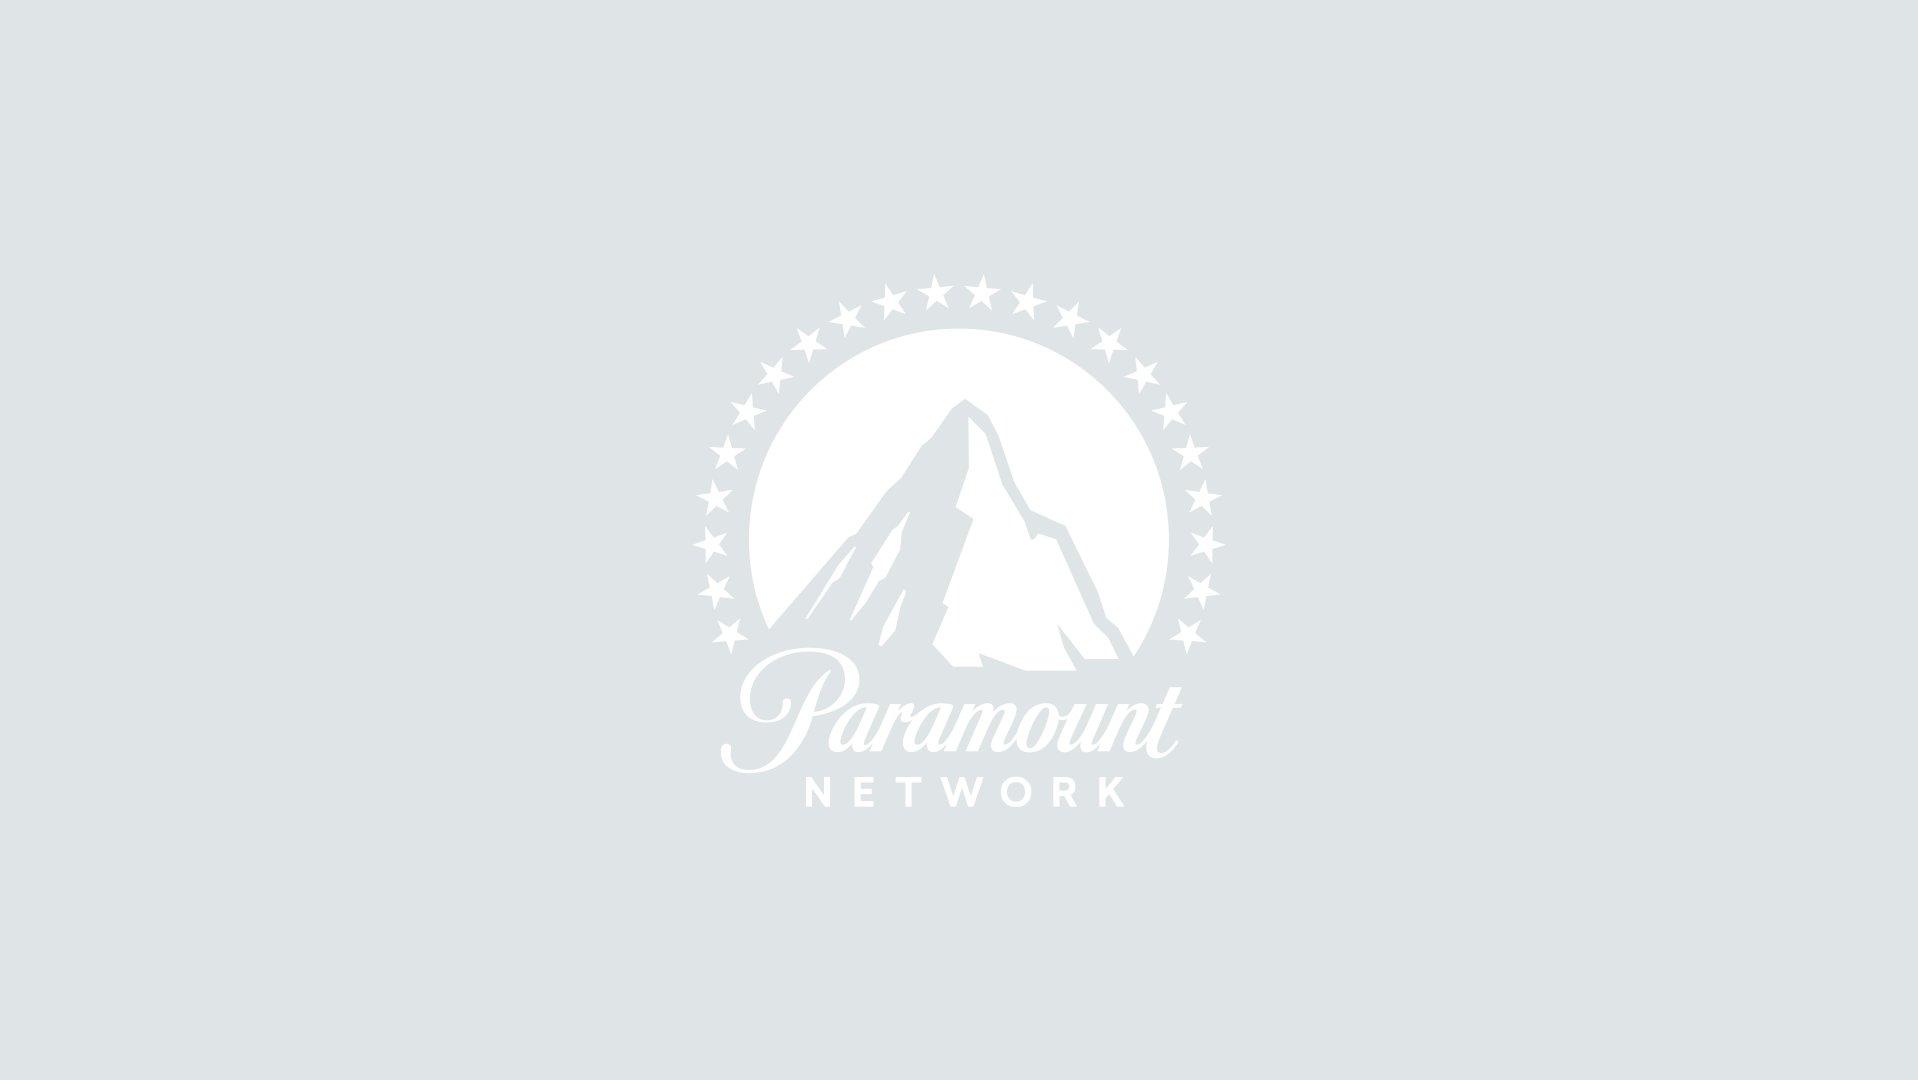 Lady Gaga e Bradley Cooper (A Star Is Born), foto: Getty Images